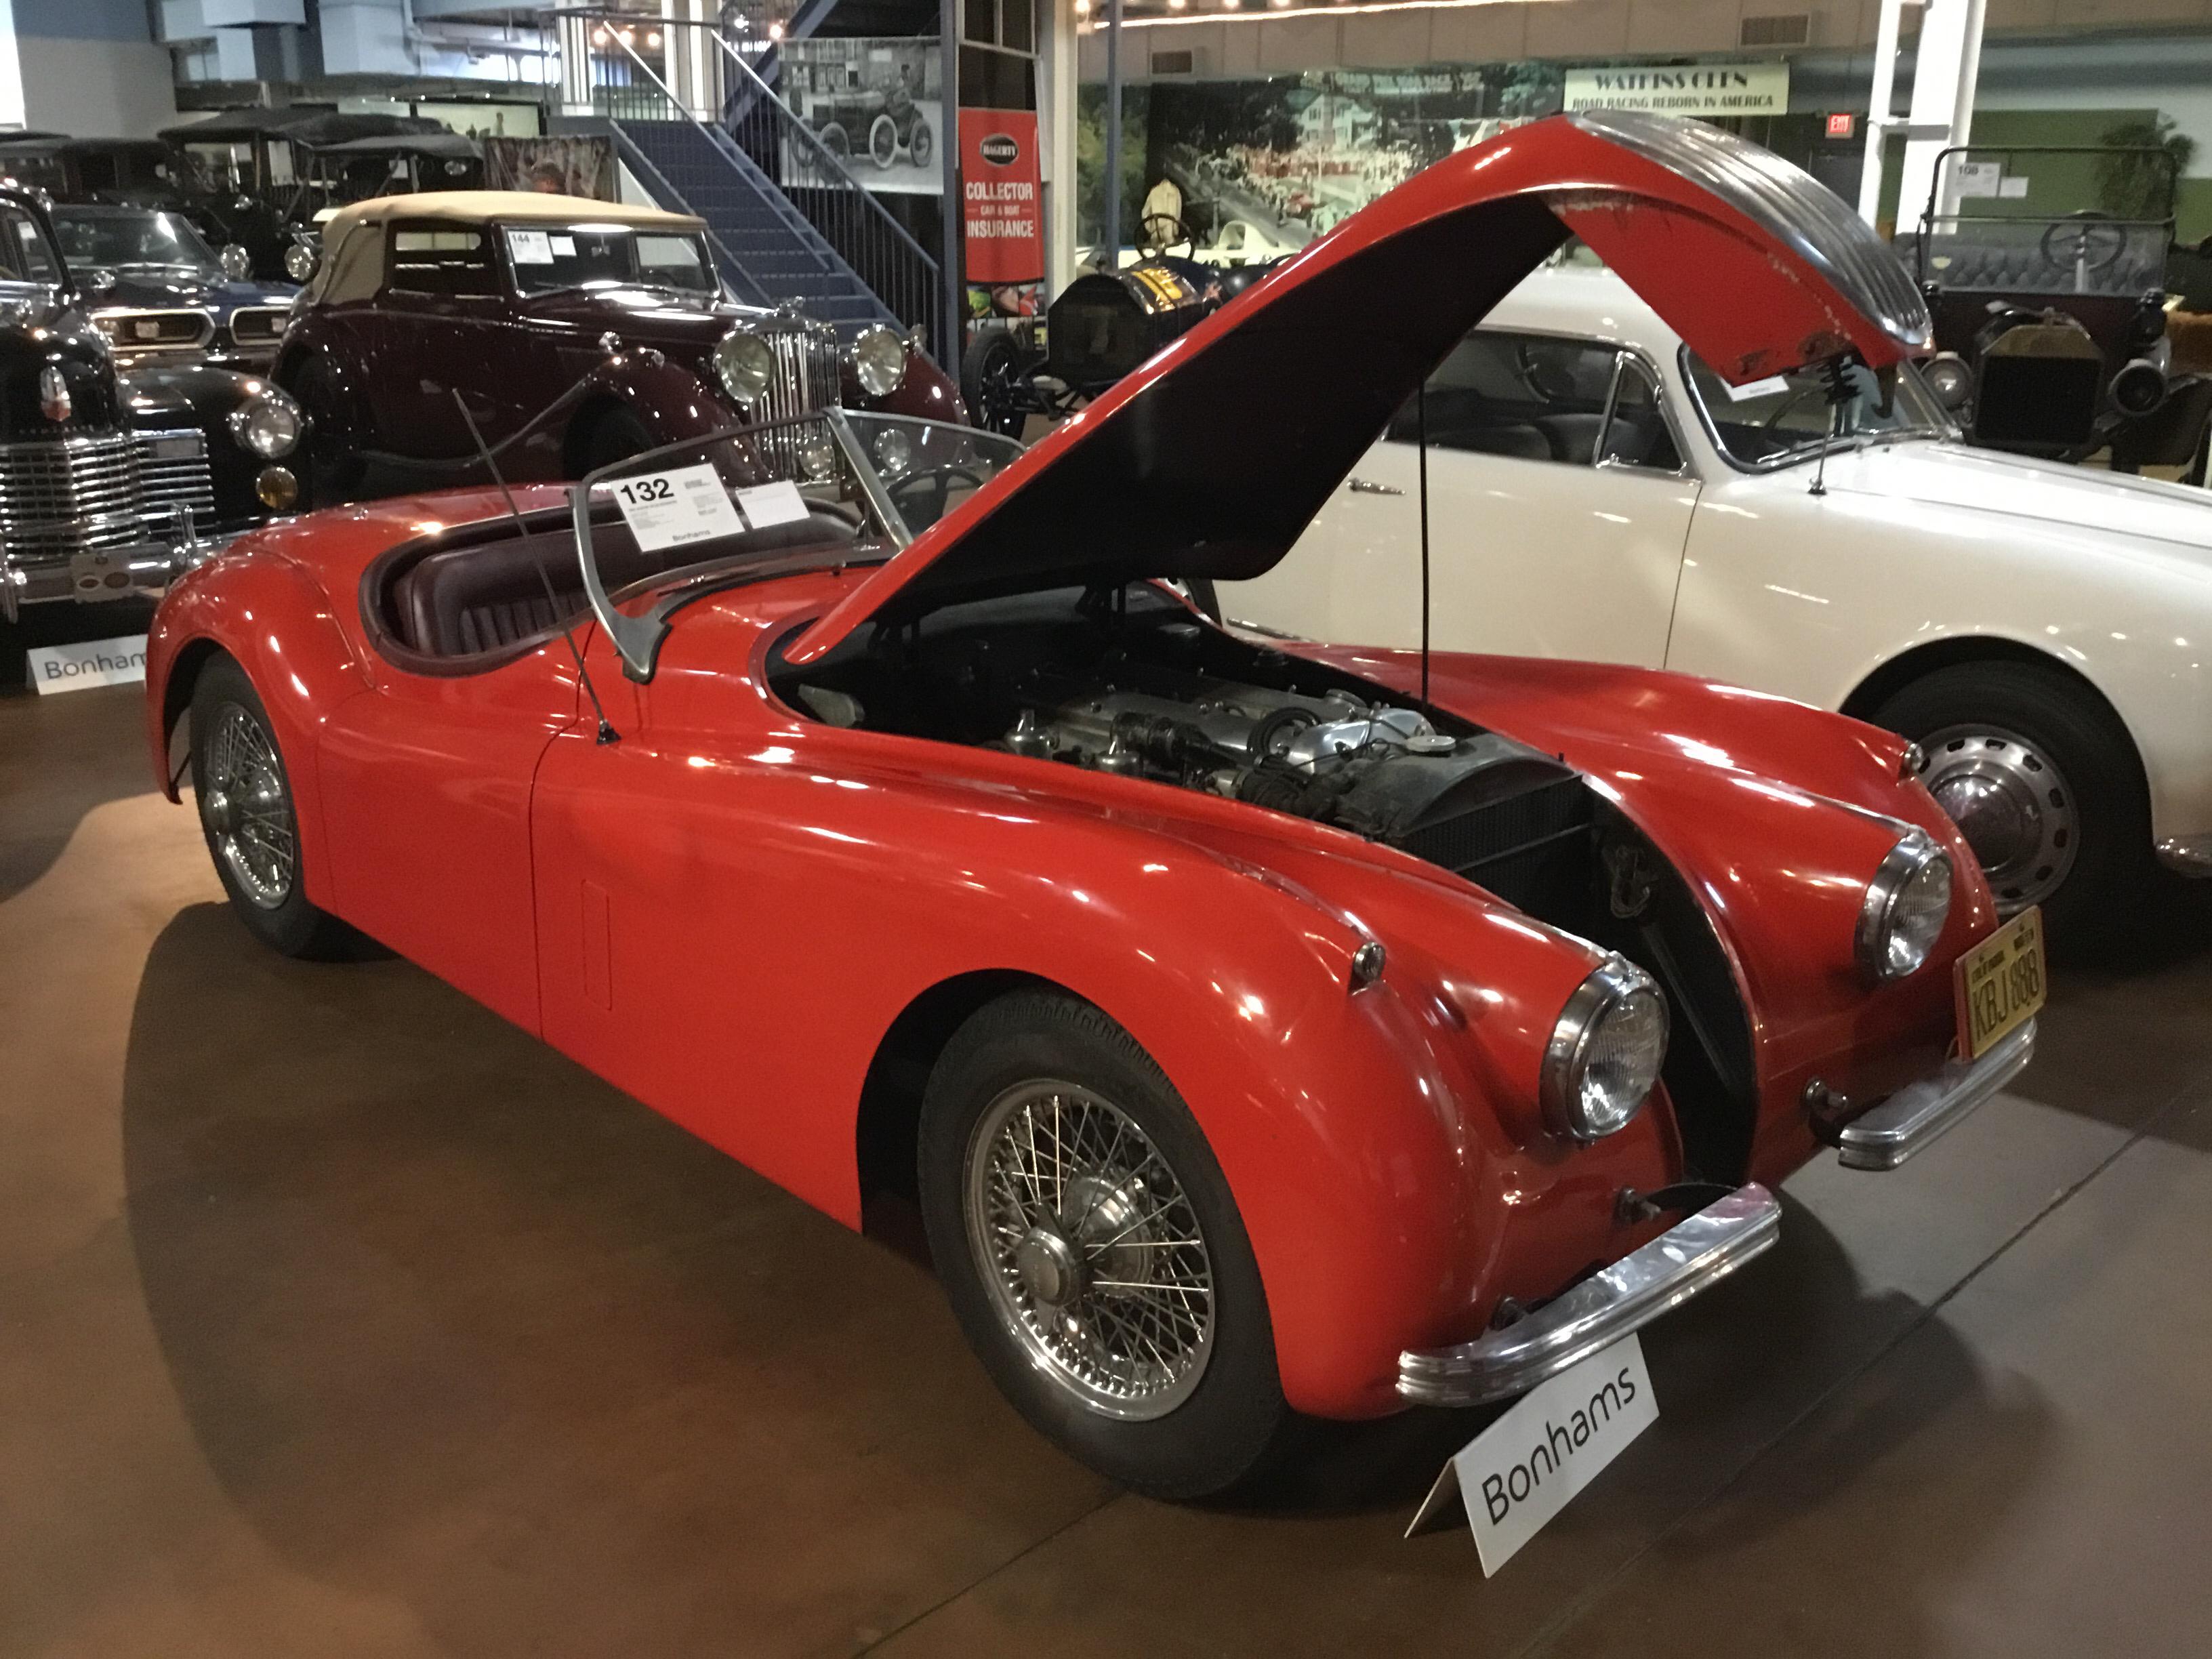 1953 jaguar xk 120 values | hagerty valuation tool®